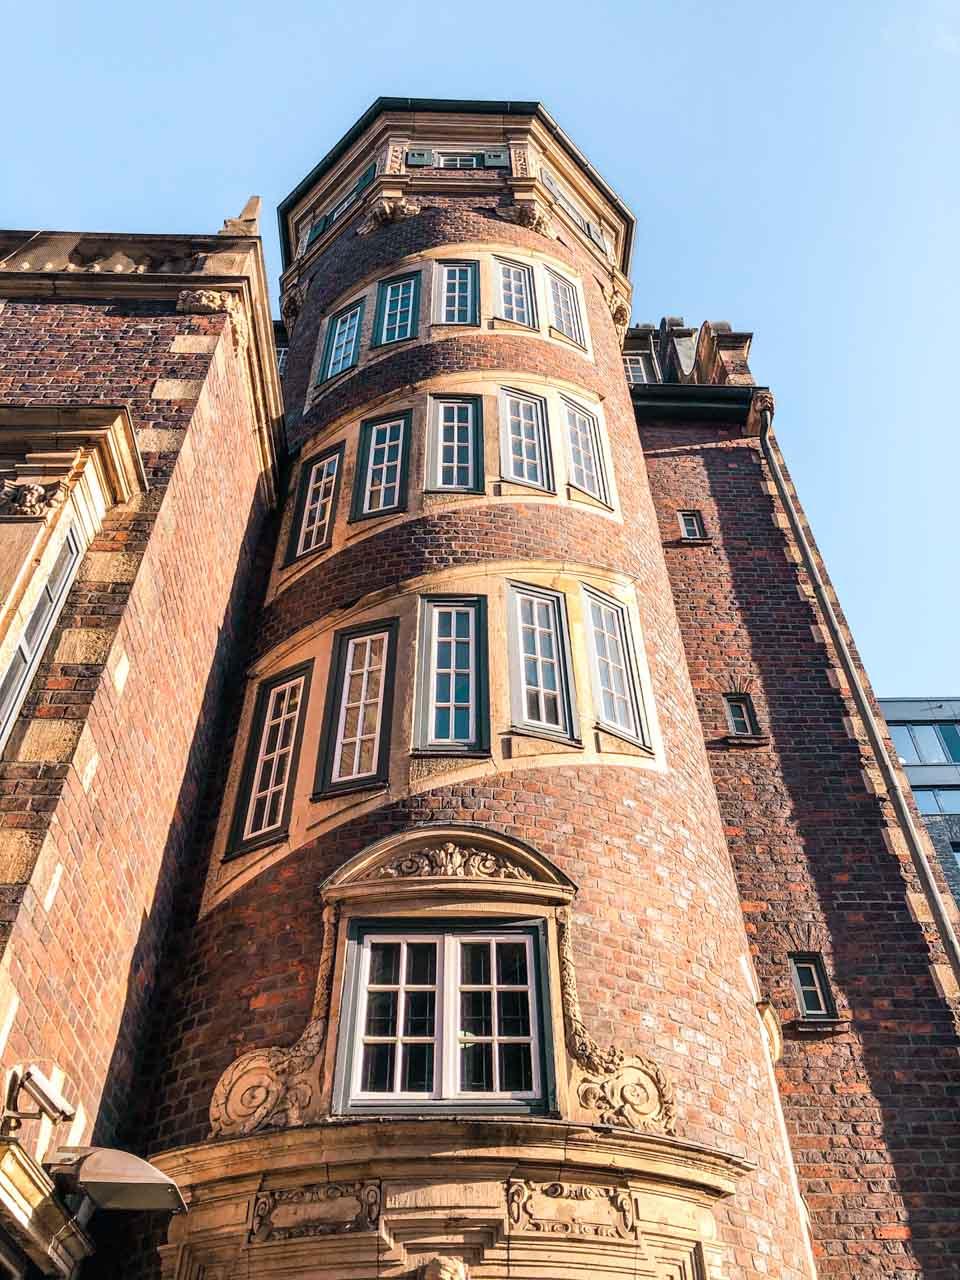 The Bishop's Tower in Hamburg, Germany